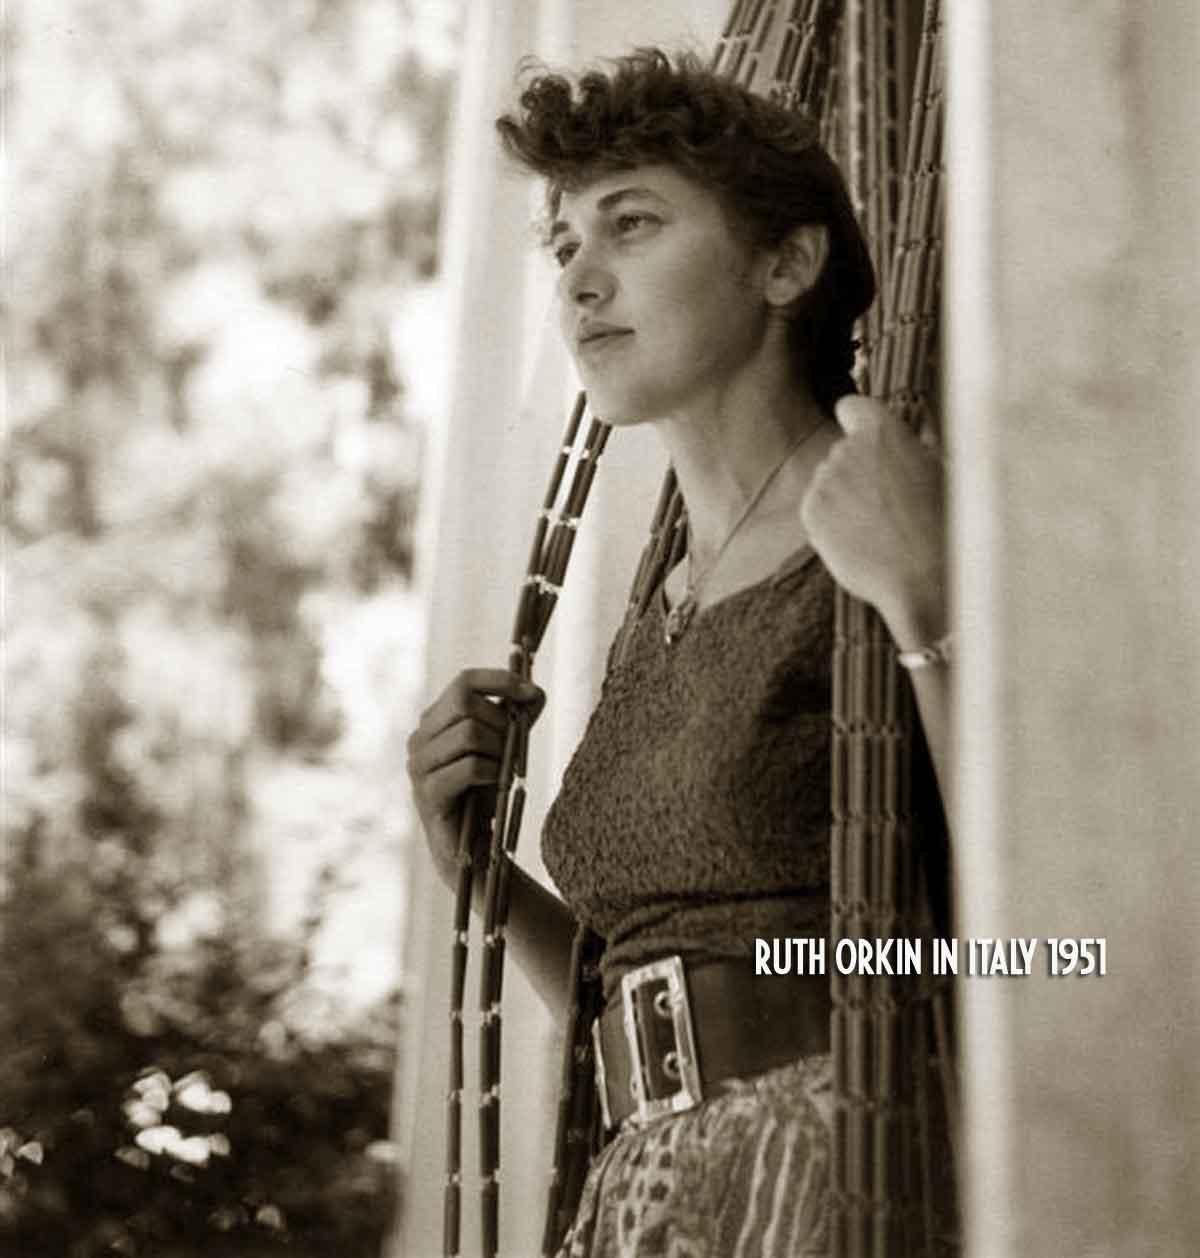 Ruth-Orkin-In-Italy-1951